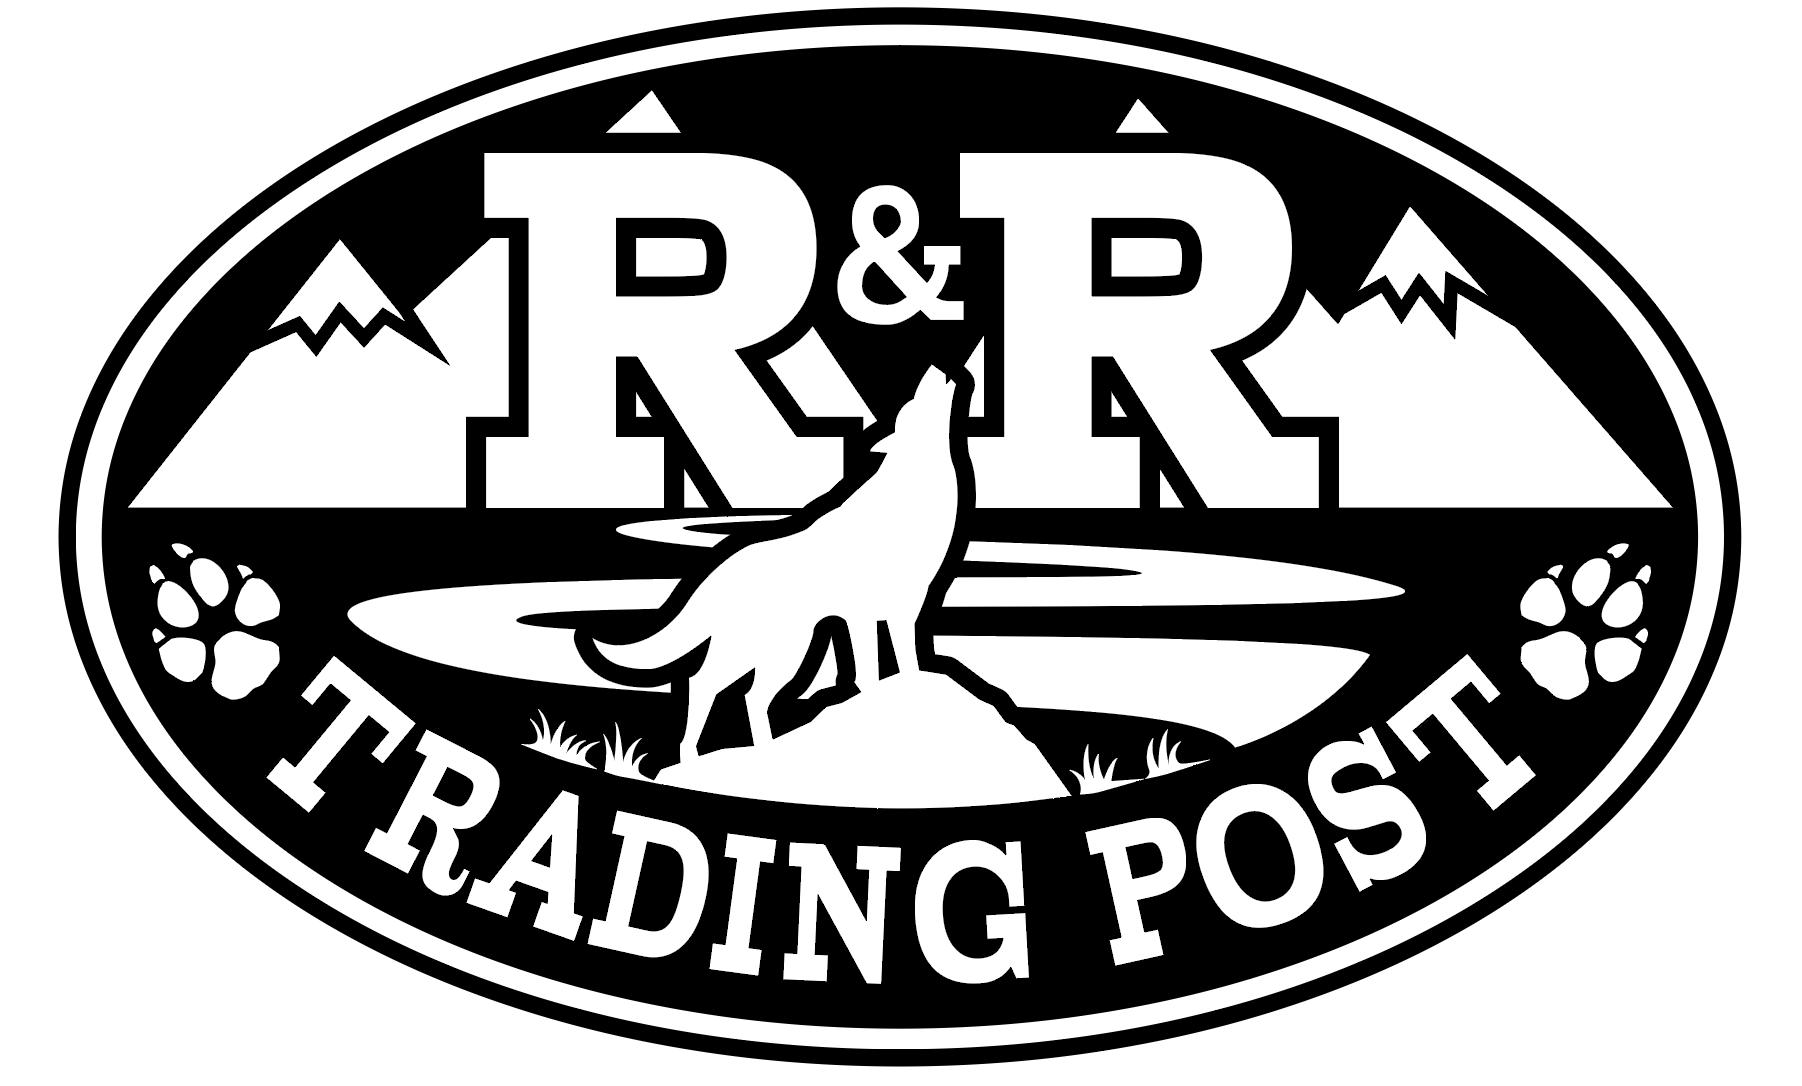 www.randrtradingpost.com